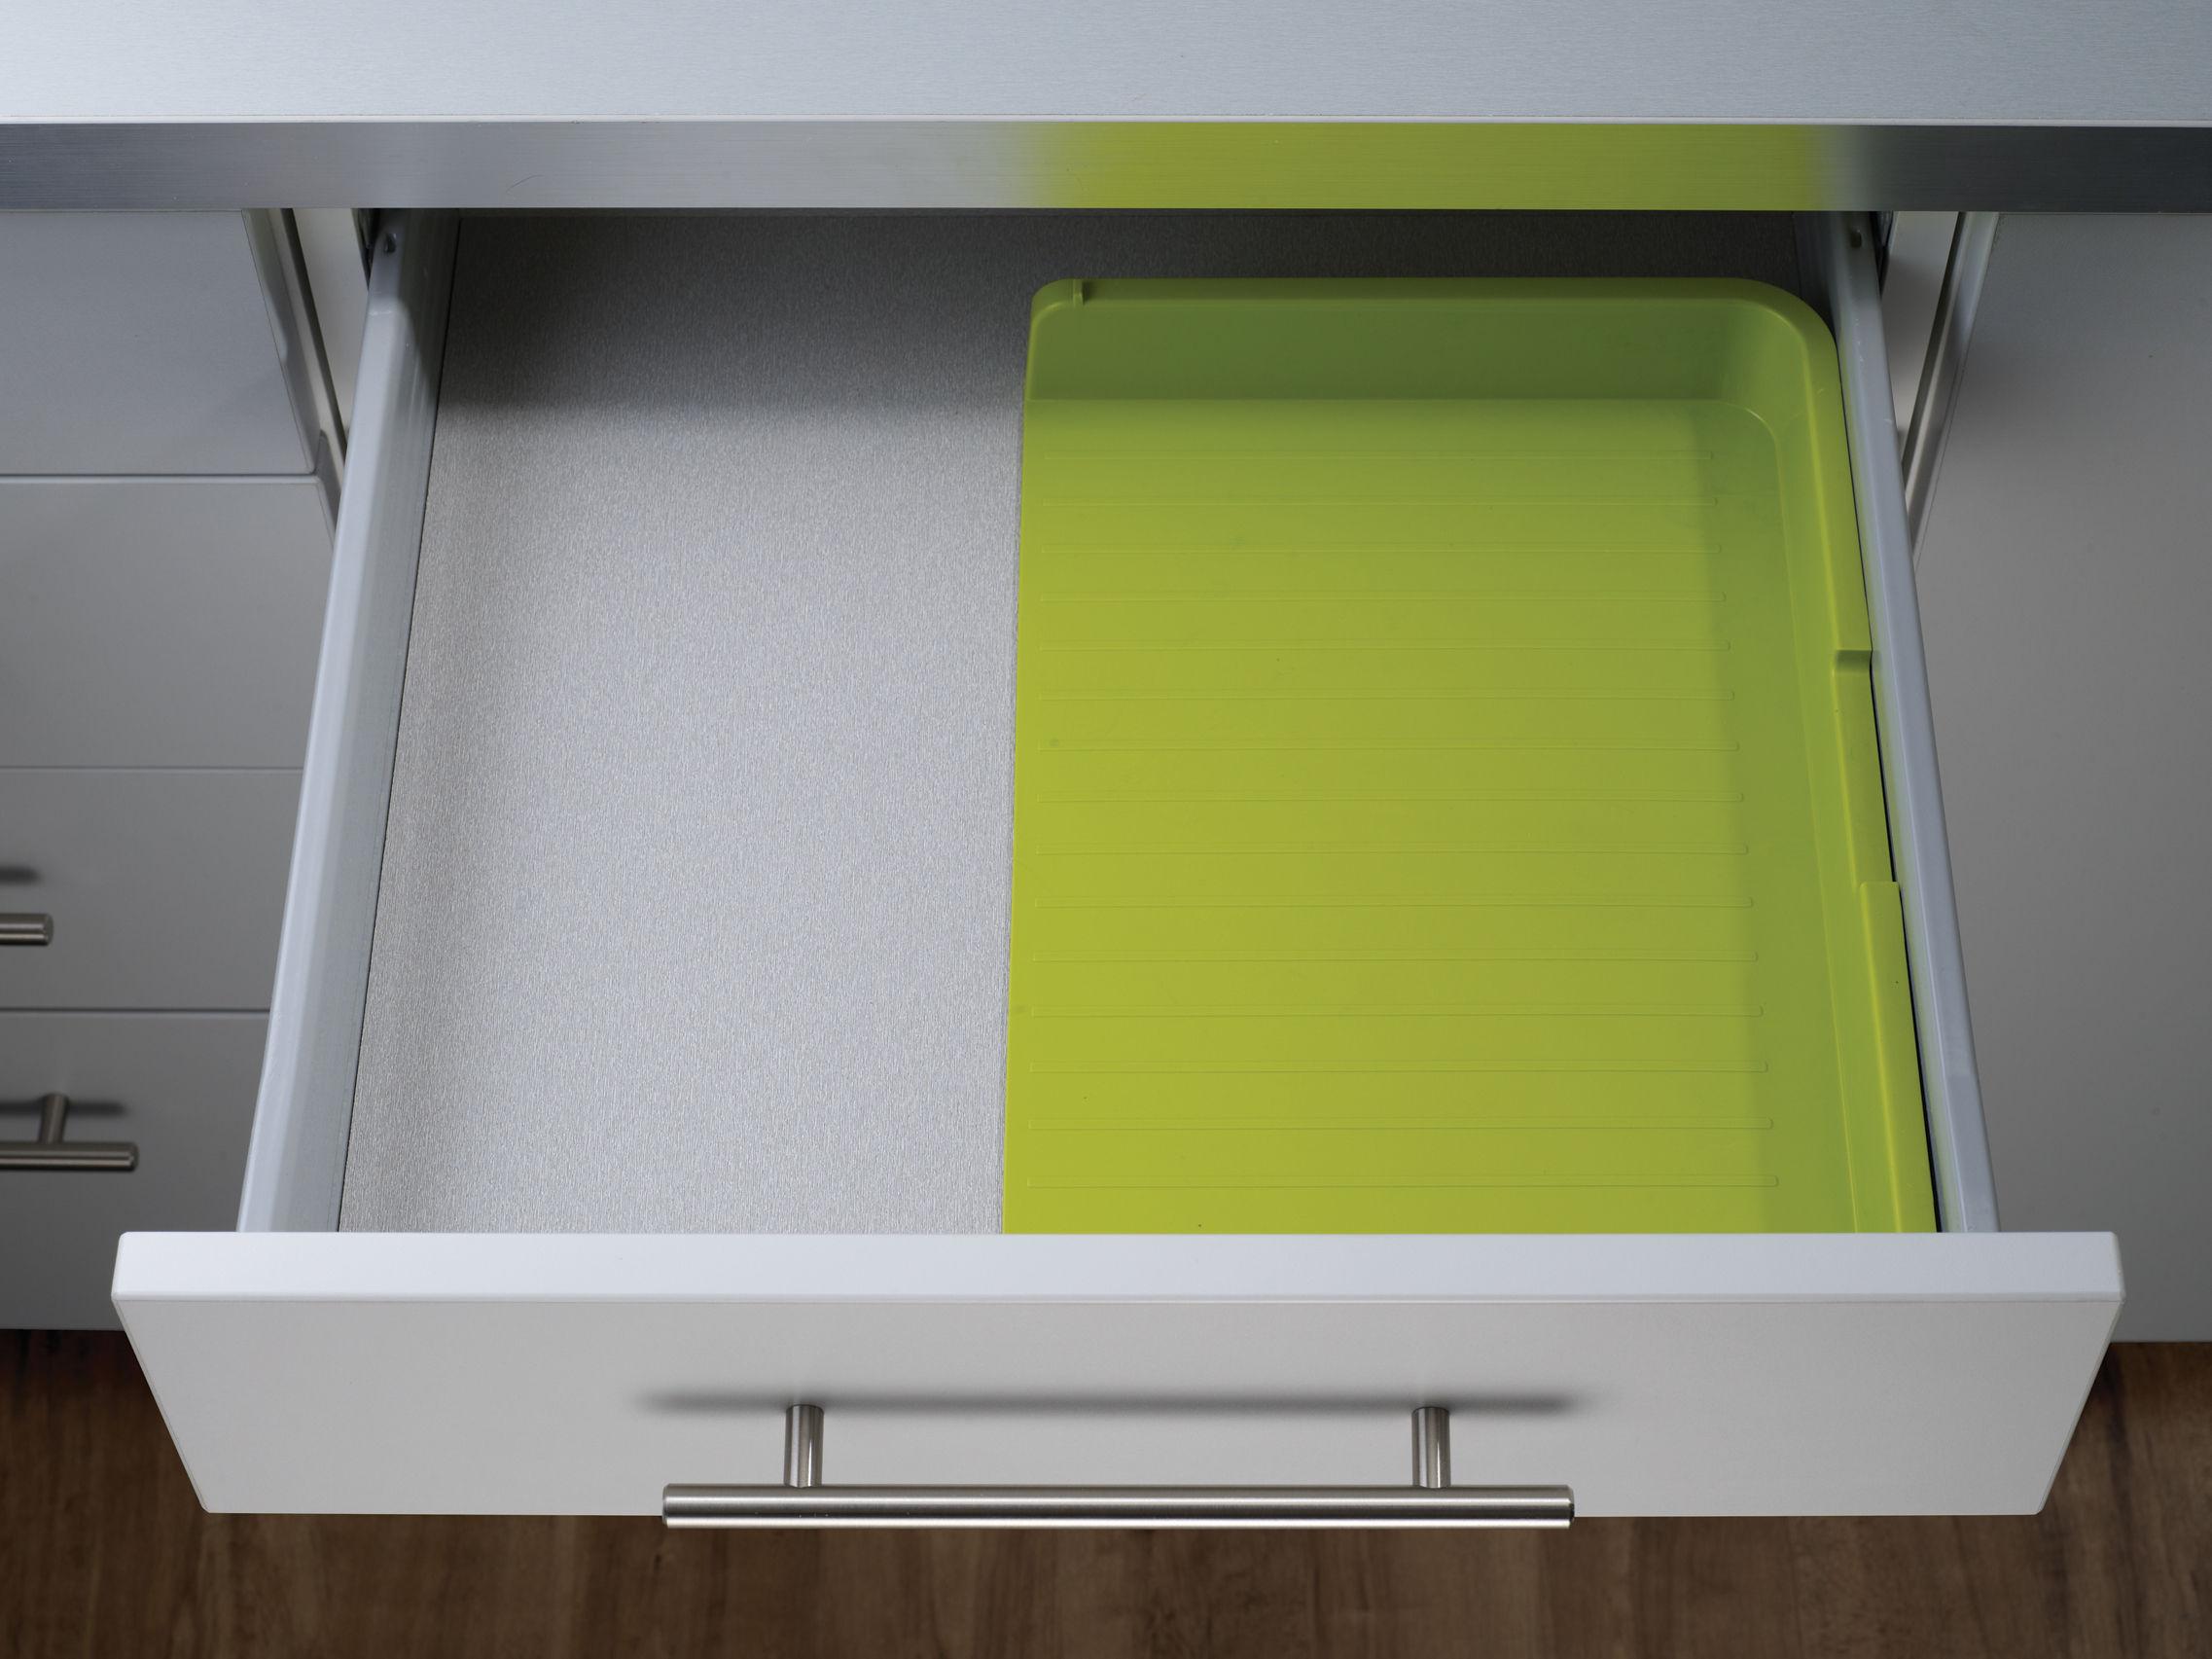 porte couverts drawerstore extensible blanc gris joseph joseph. Black Bedroom Furniture Sets. Home Design Ideas